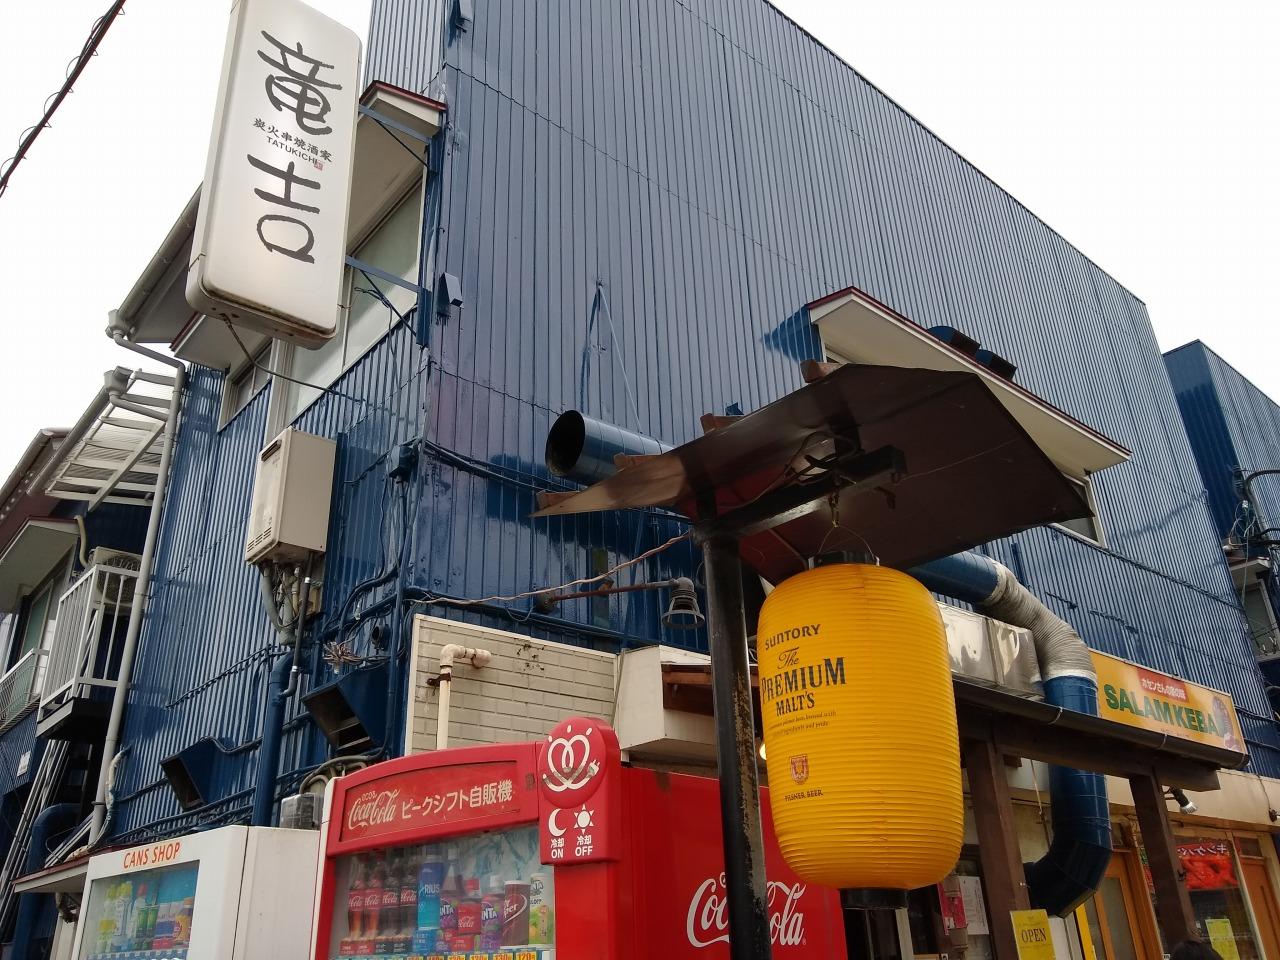 綱島東の竜吉